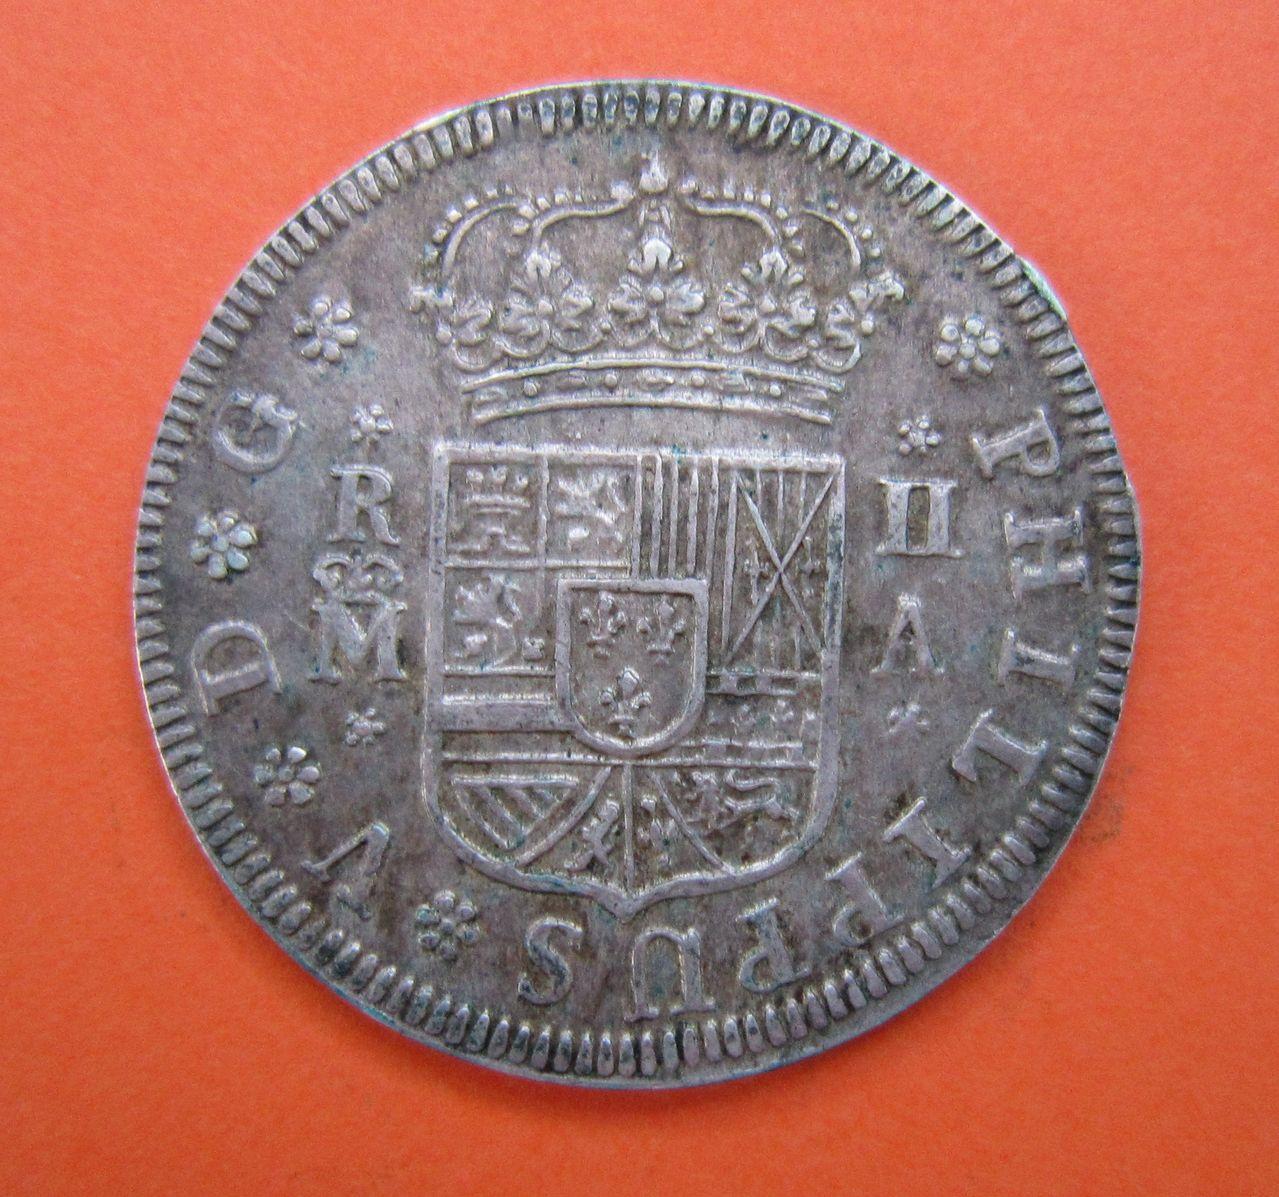 2 reales. Felipe V. 1721. Madrid 2_reales_1721_Madrid_Felipe_V_anv